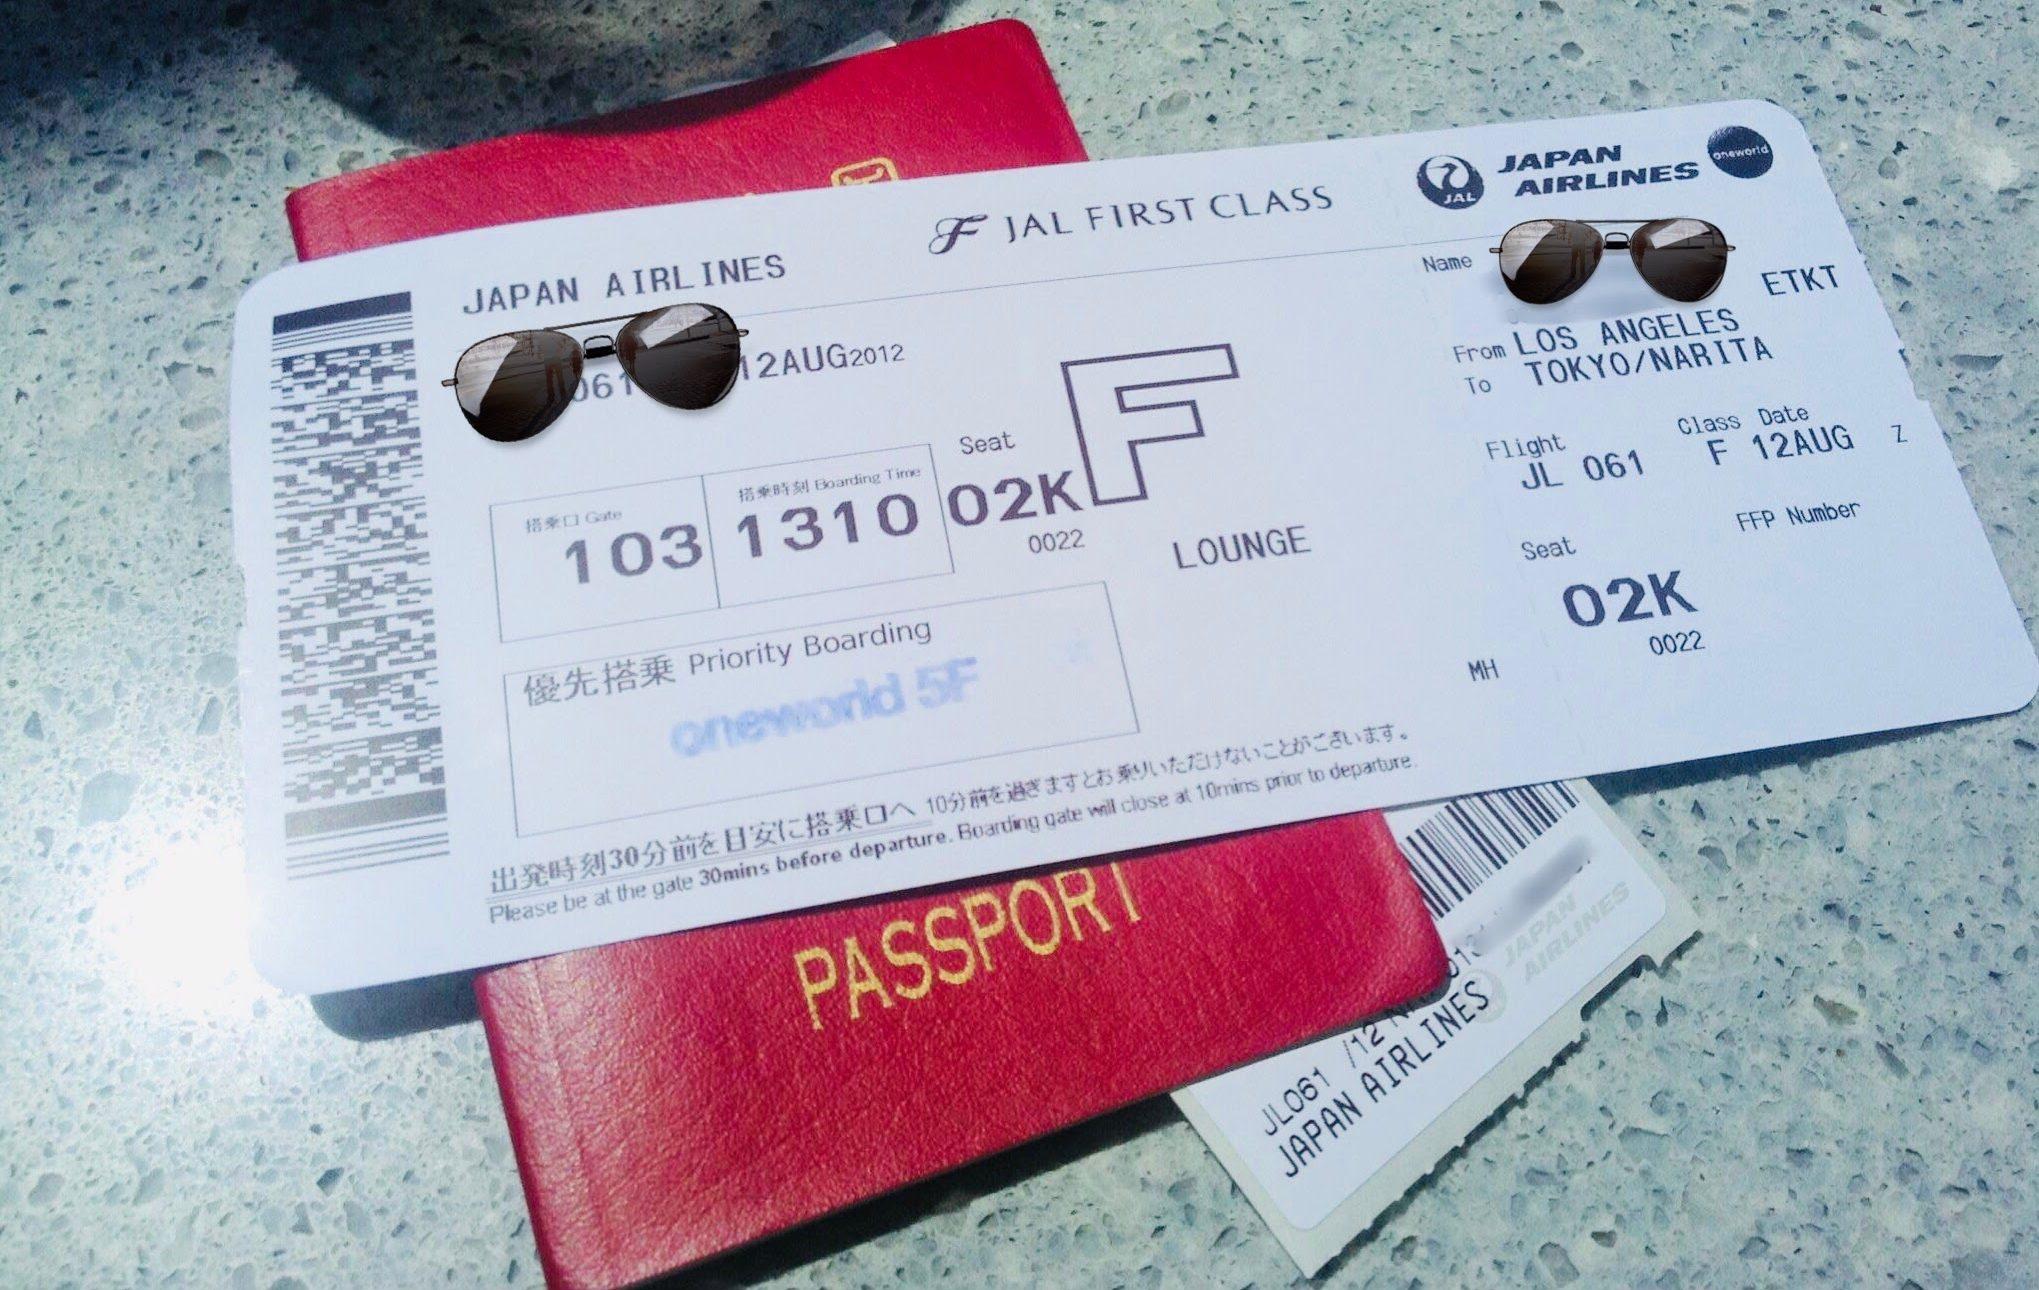 JAL First Class Ticket